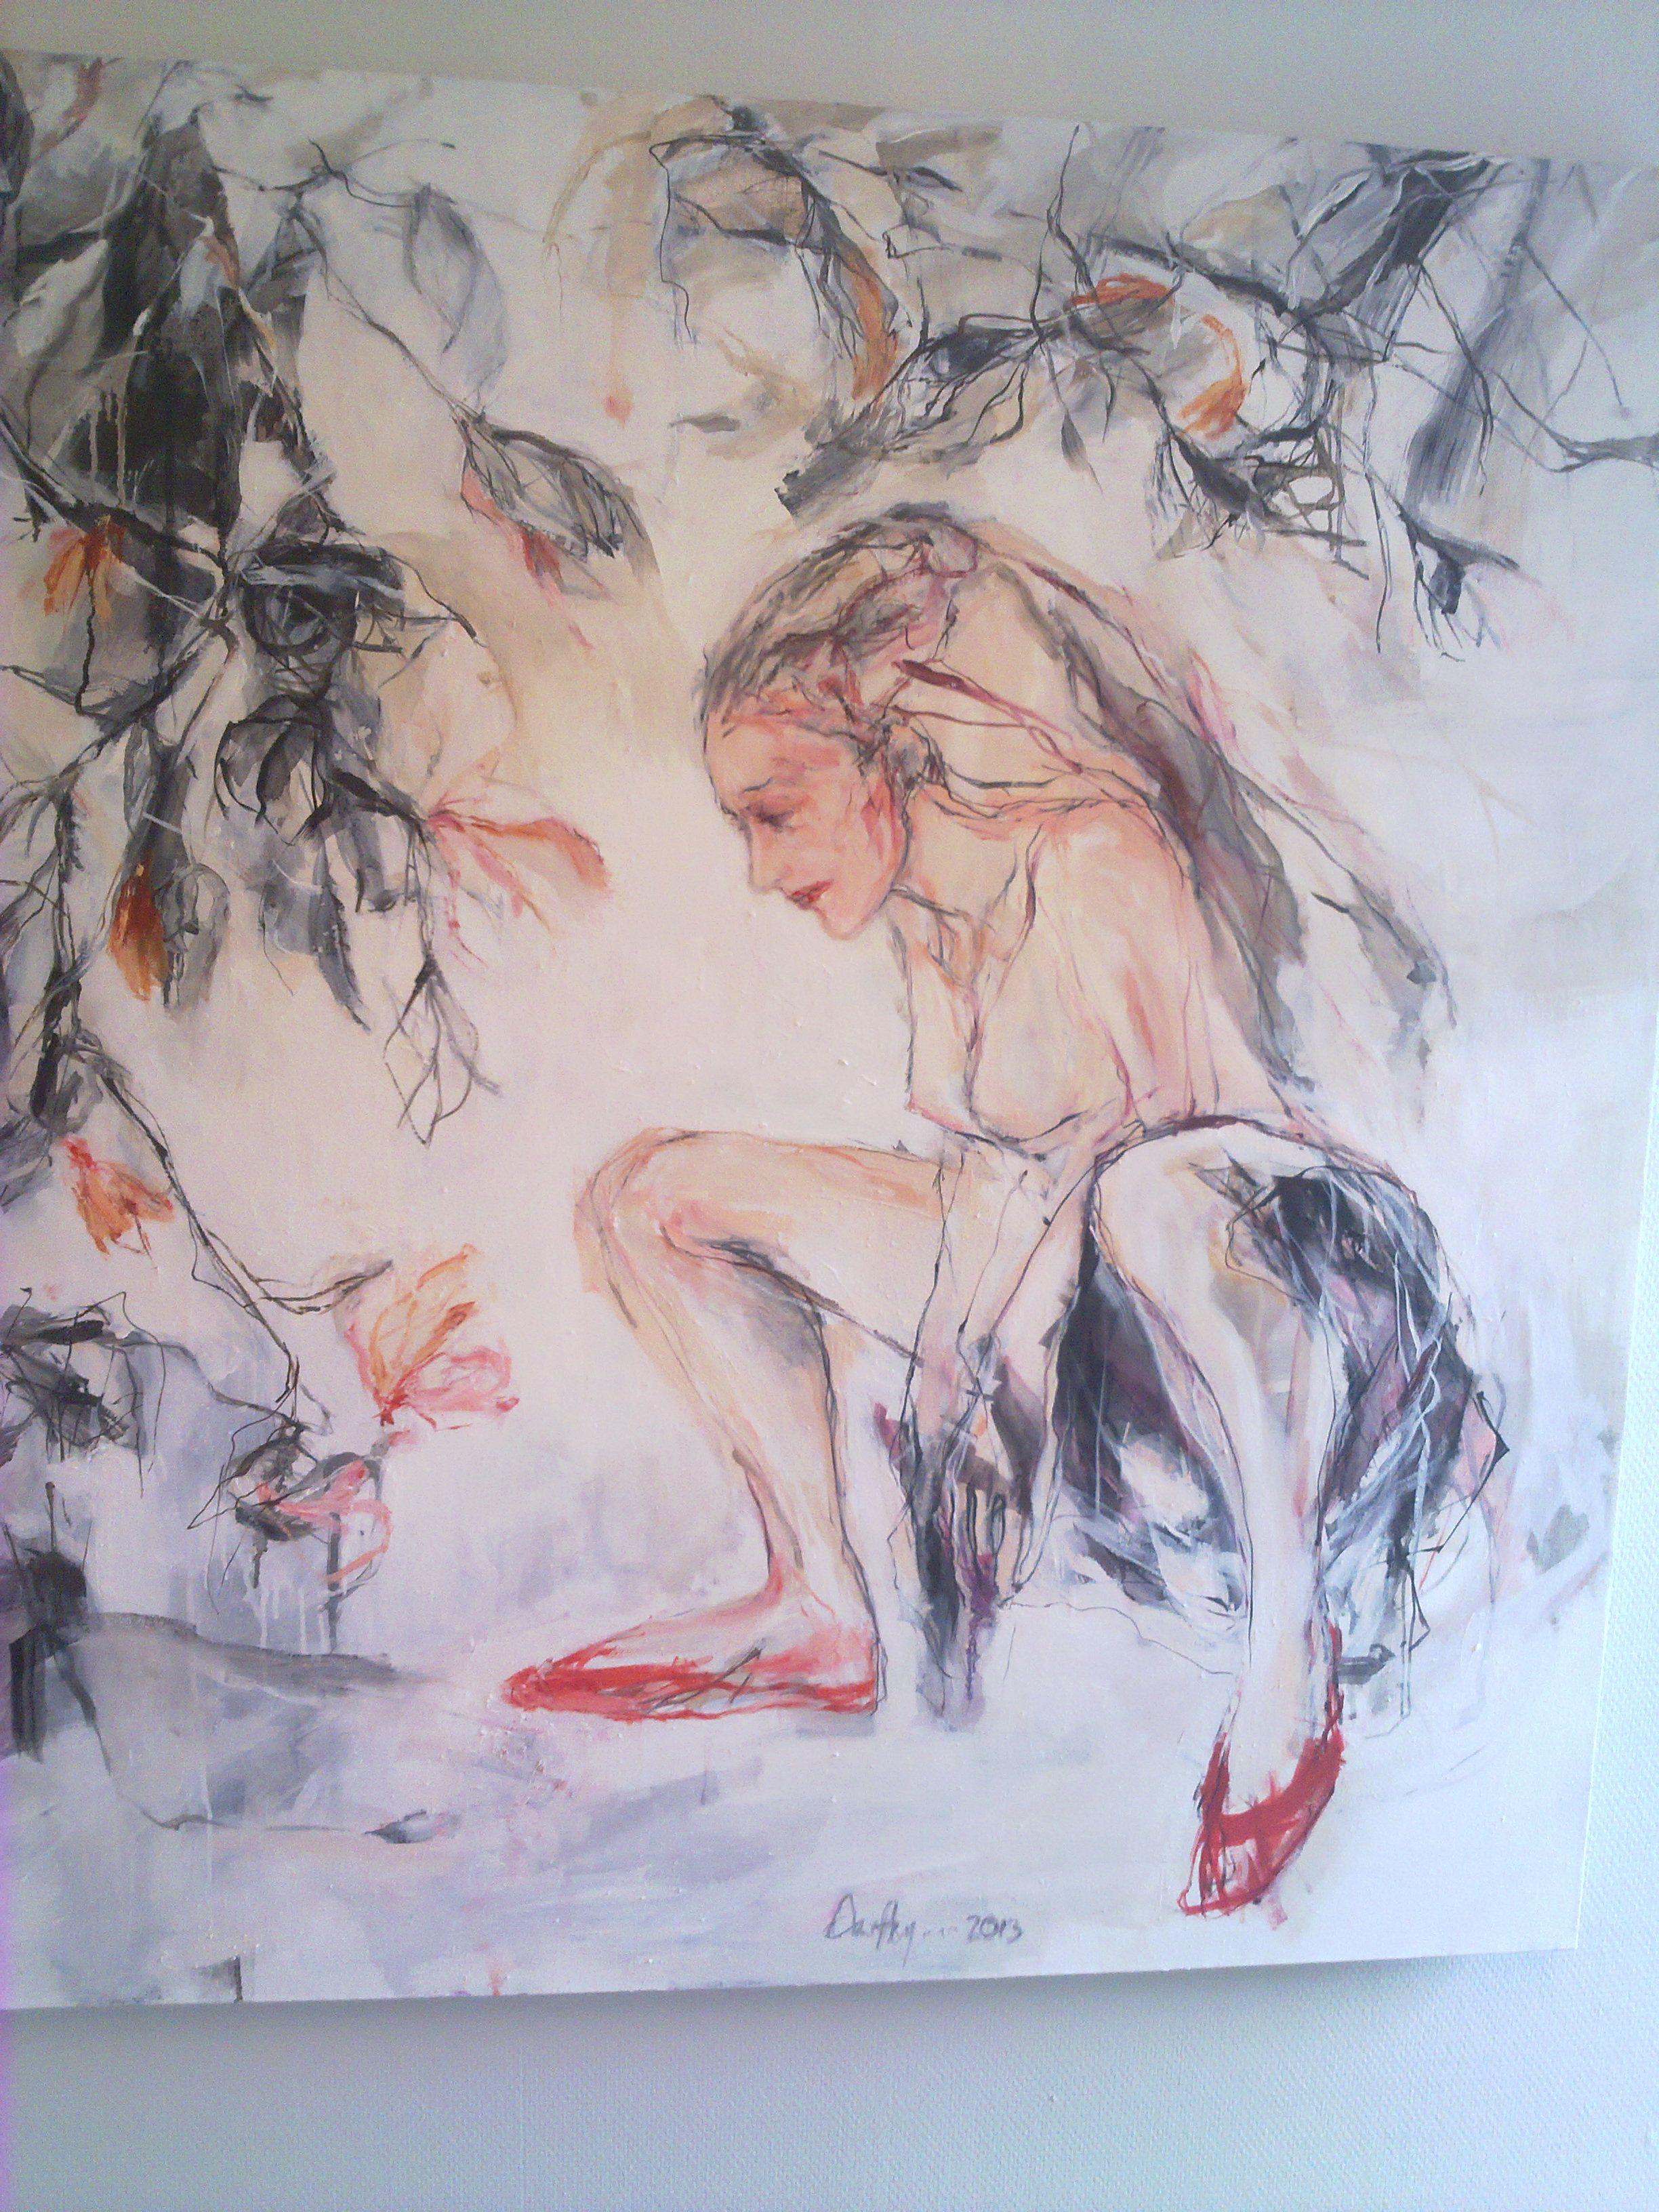 Anne Hyvönen: Rukousten puutarha (garden of prayers)